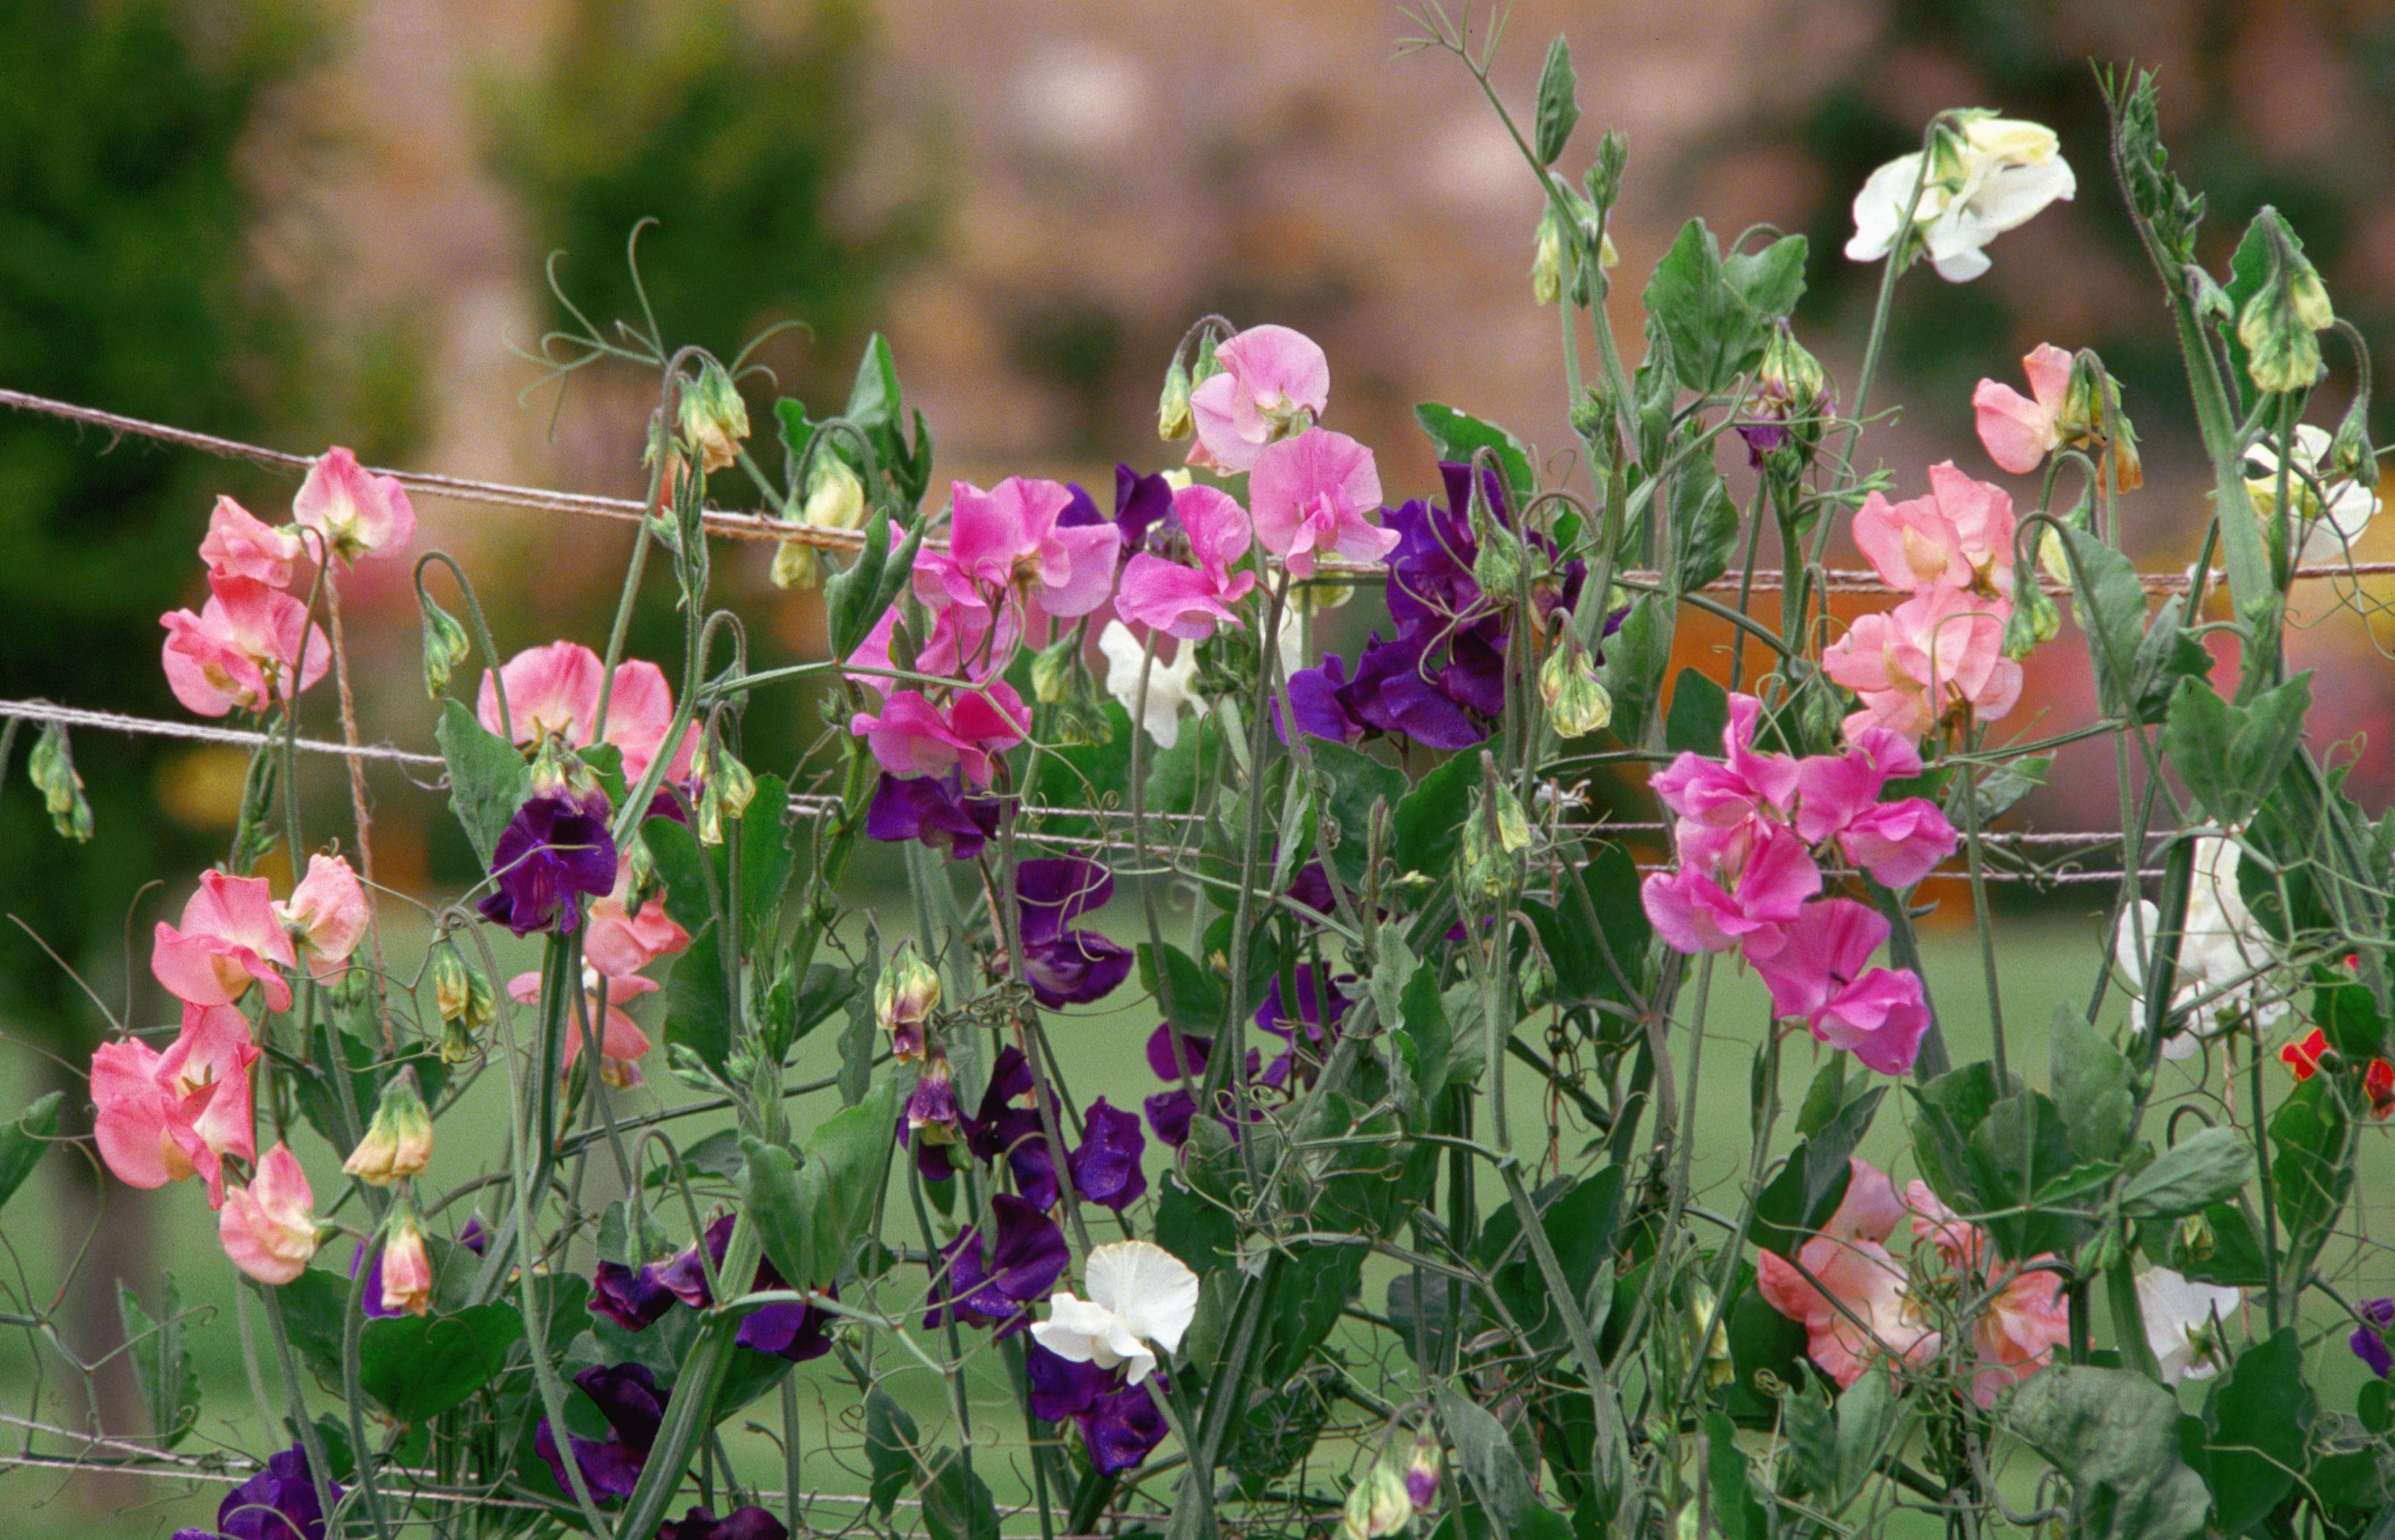 Sweet Pea (Lathyrus spp.)